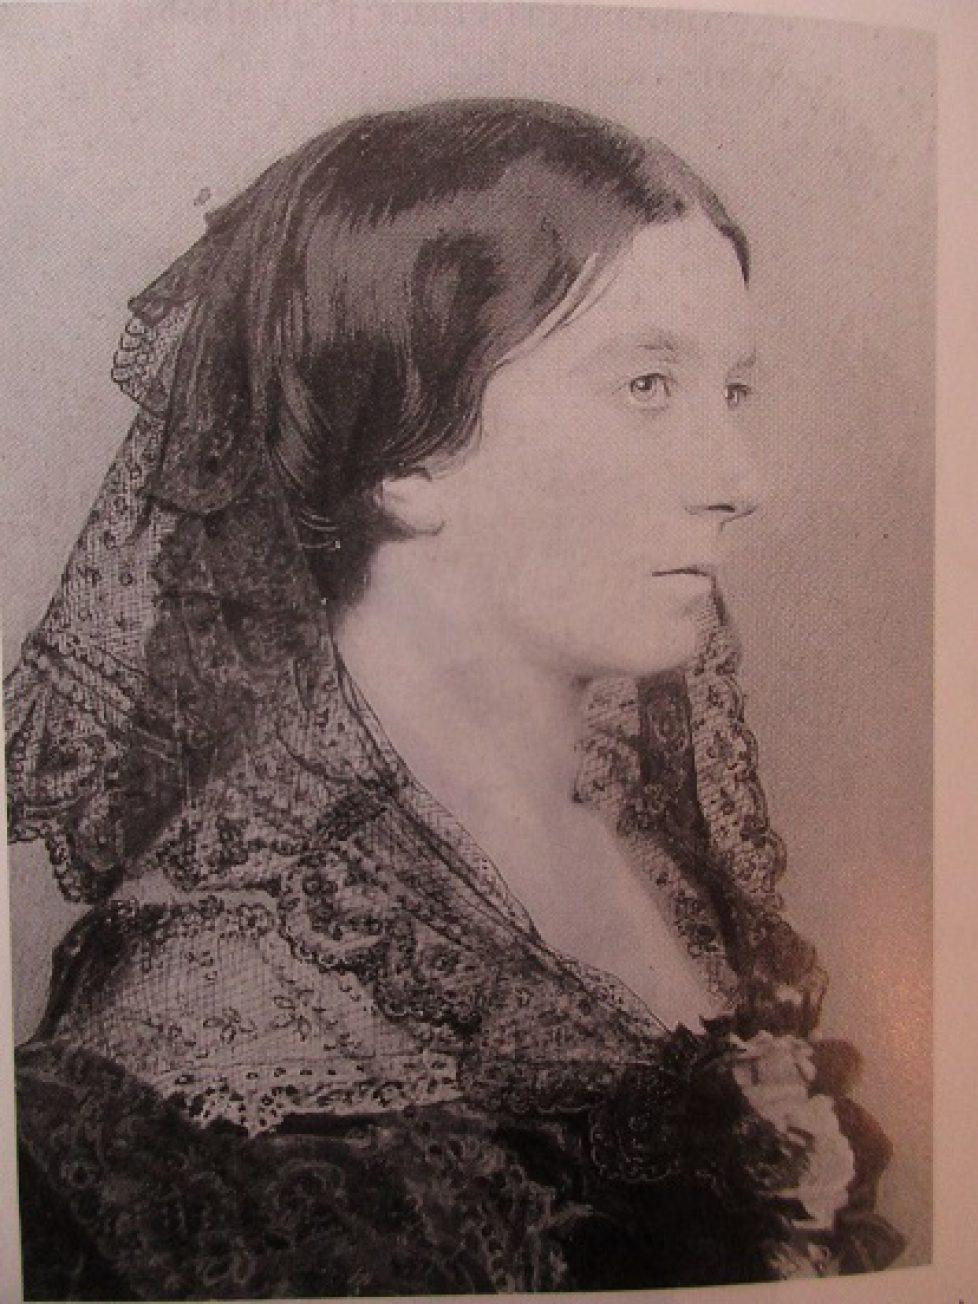 1-clara-bischoffssheim-baronne-de-hirsch-1833-1899